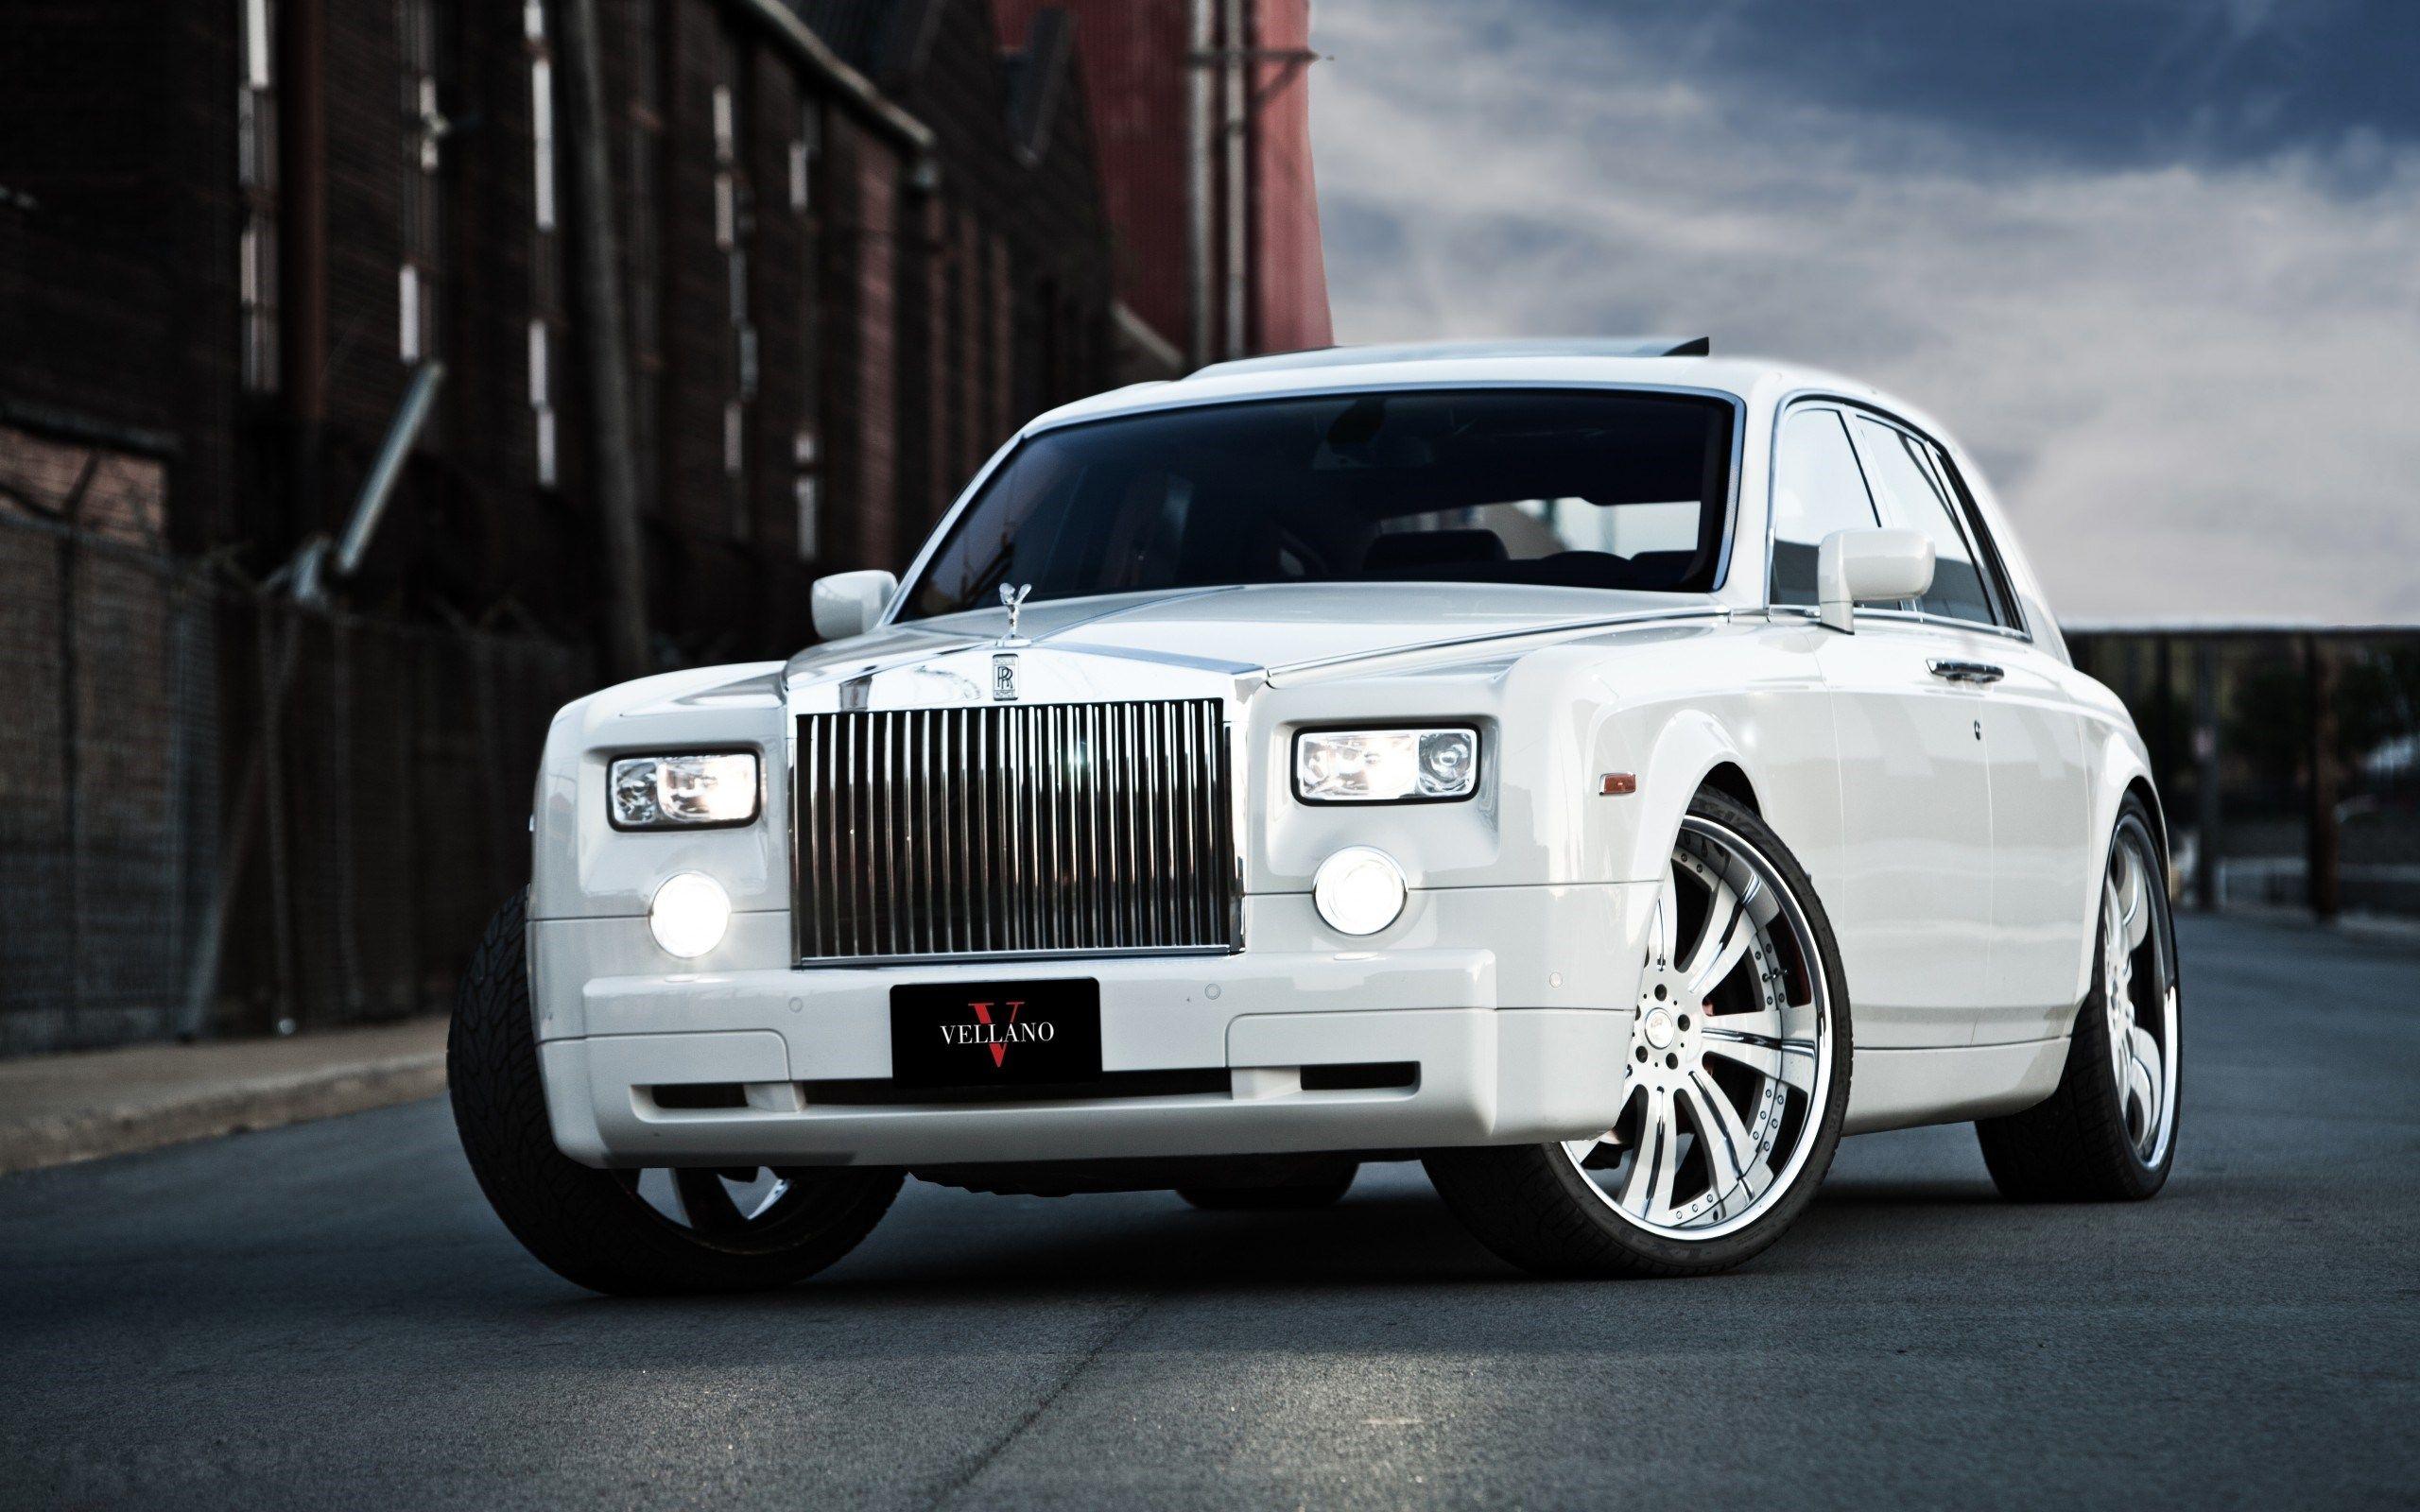 Rolls Royce Wallpaper 4 Jpg Rolls Royce Phantom Rolls Royce Phantom White Rolls Royce